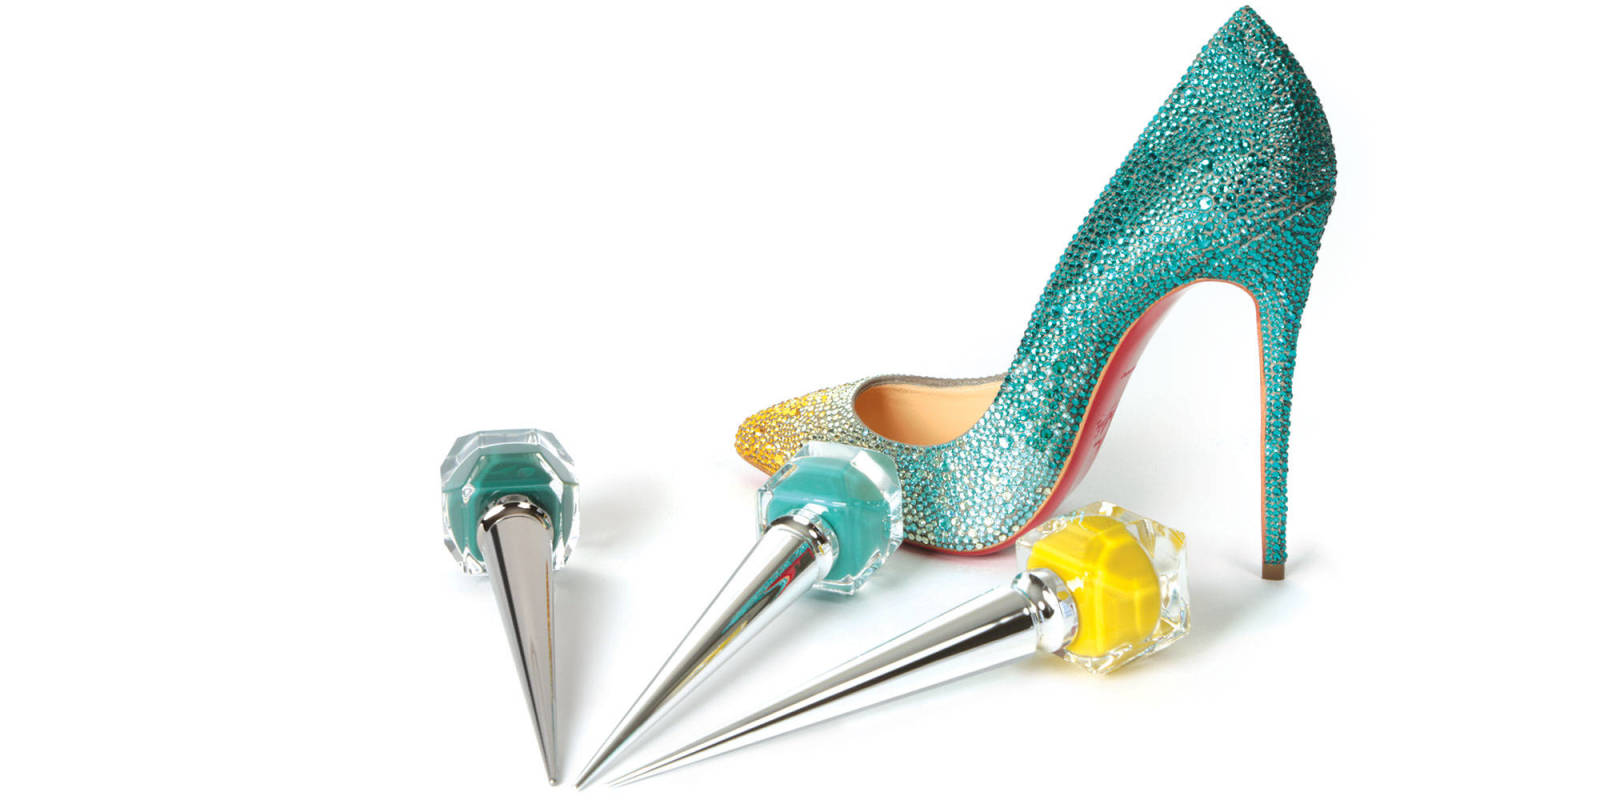 rouge louboutin nail polish harvey nichols | Landenberg Christian ...